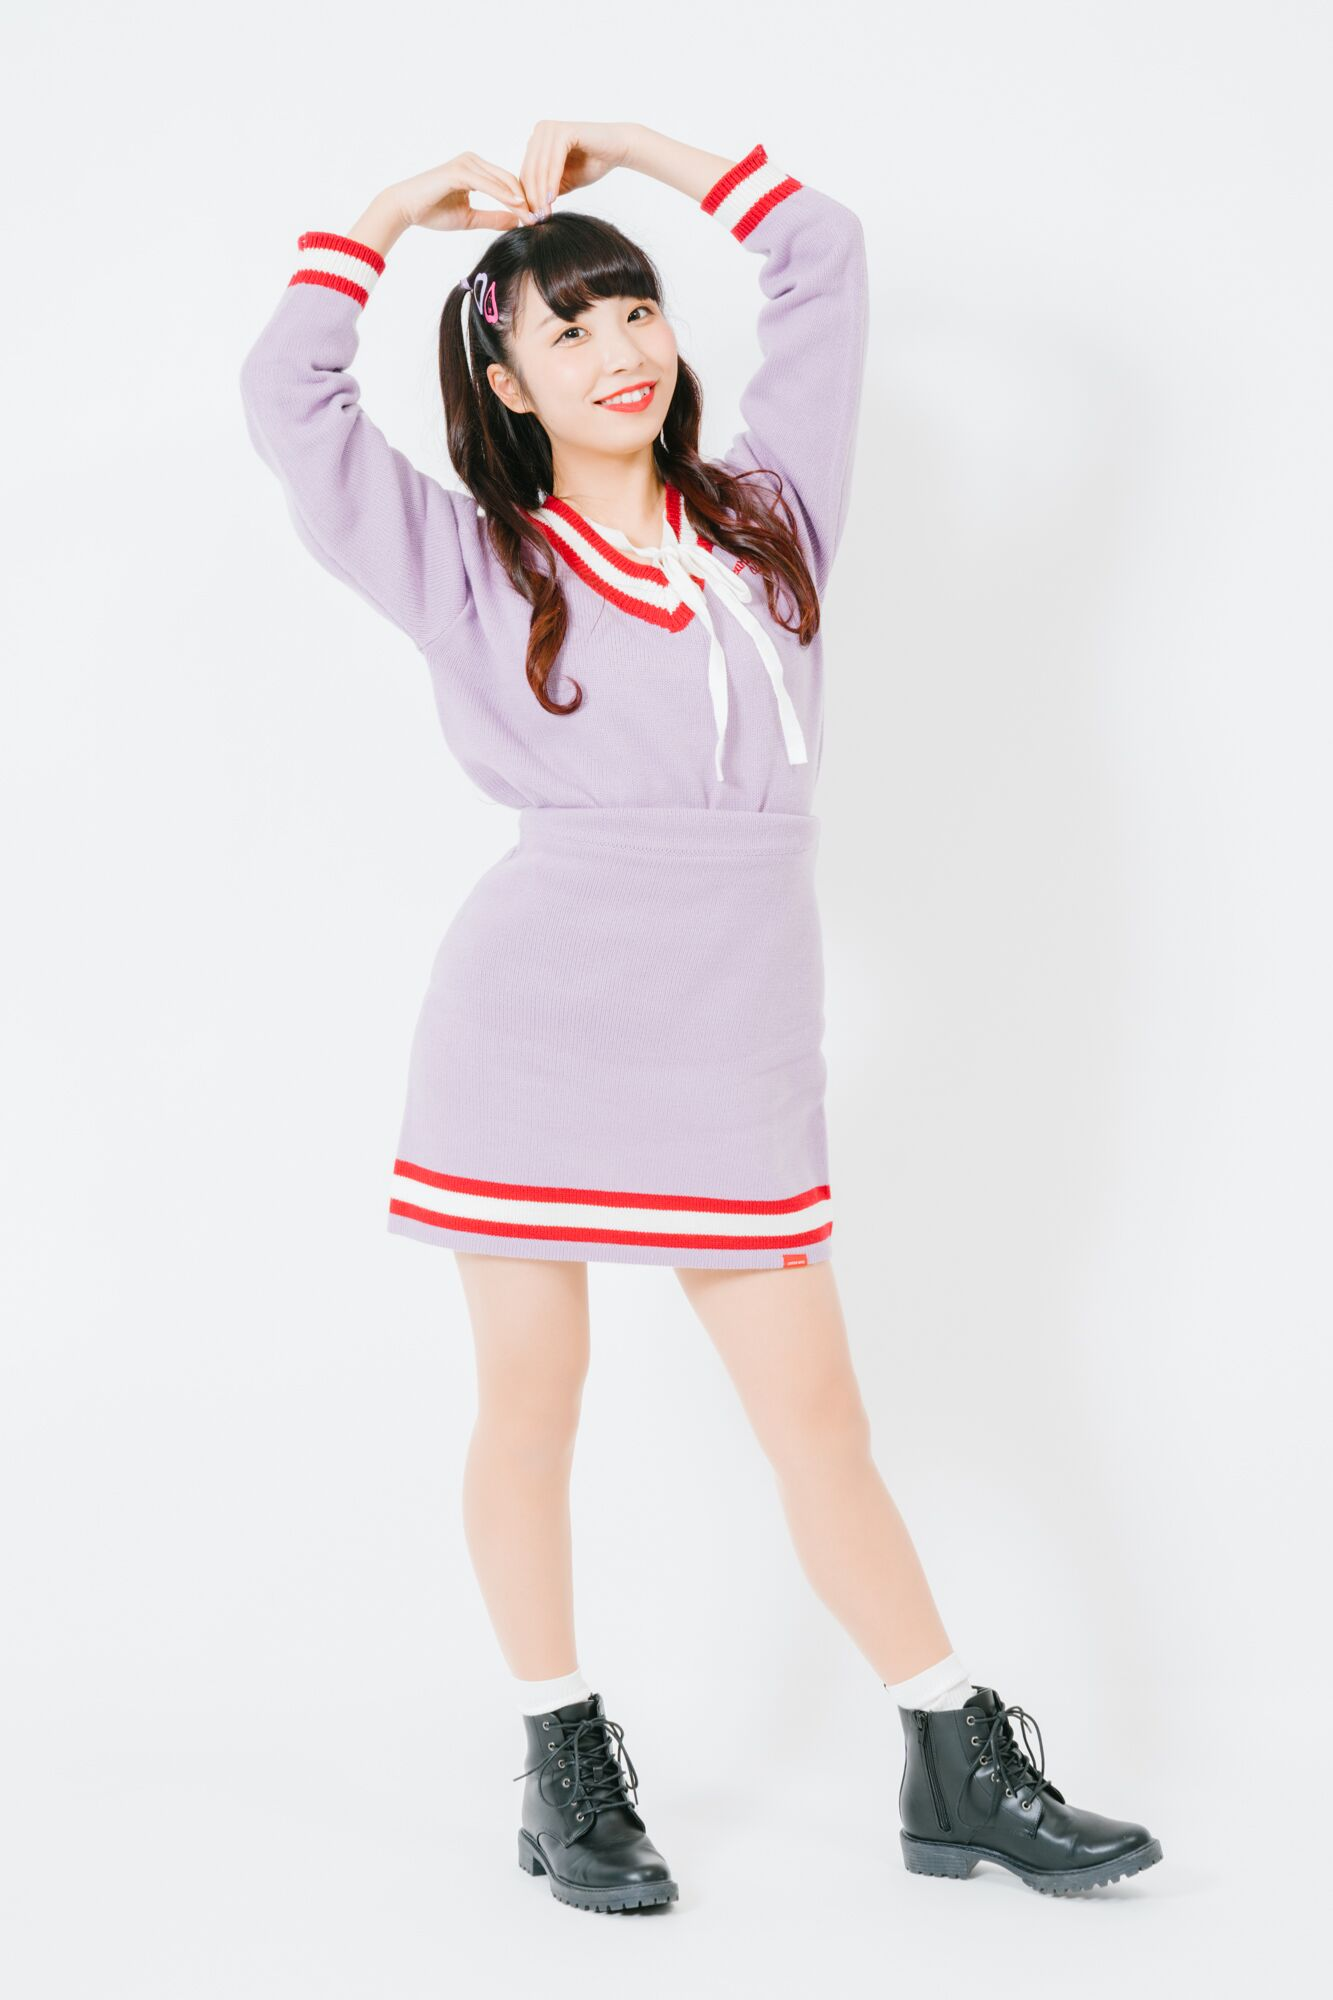 【Yuri】6/6(土)オンライントーク特典会【ROSARIO+CROSS】